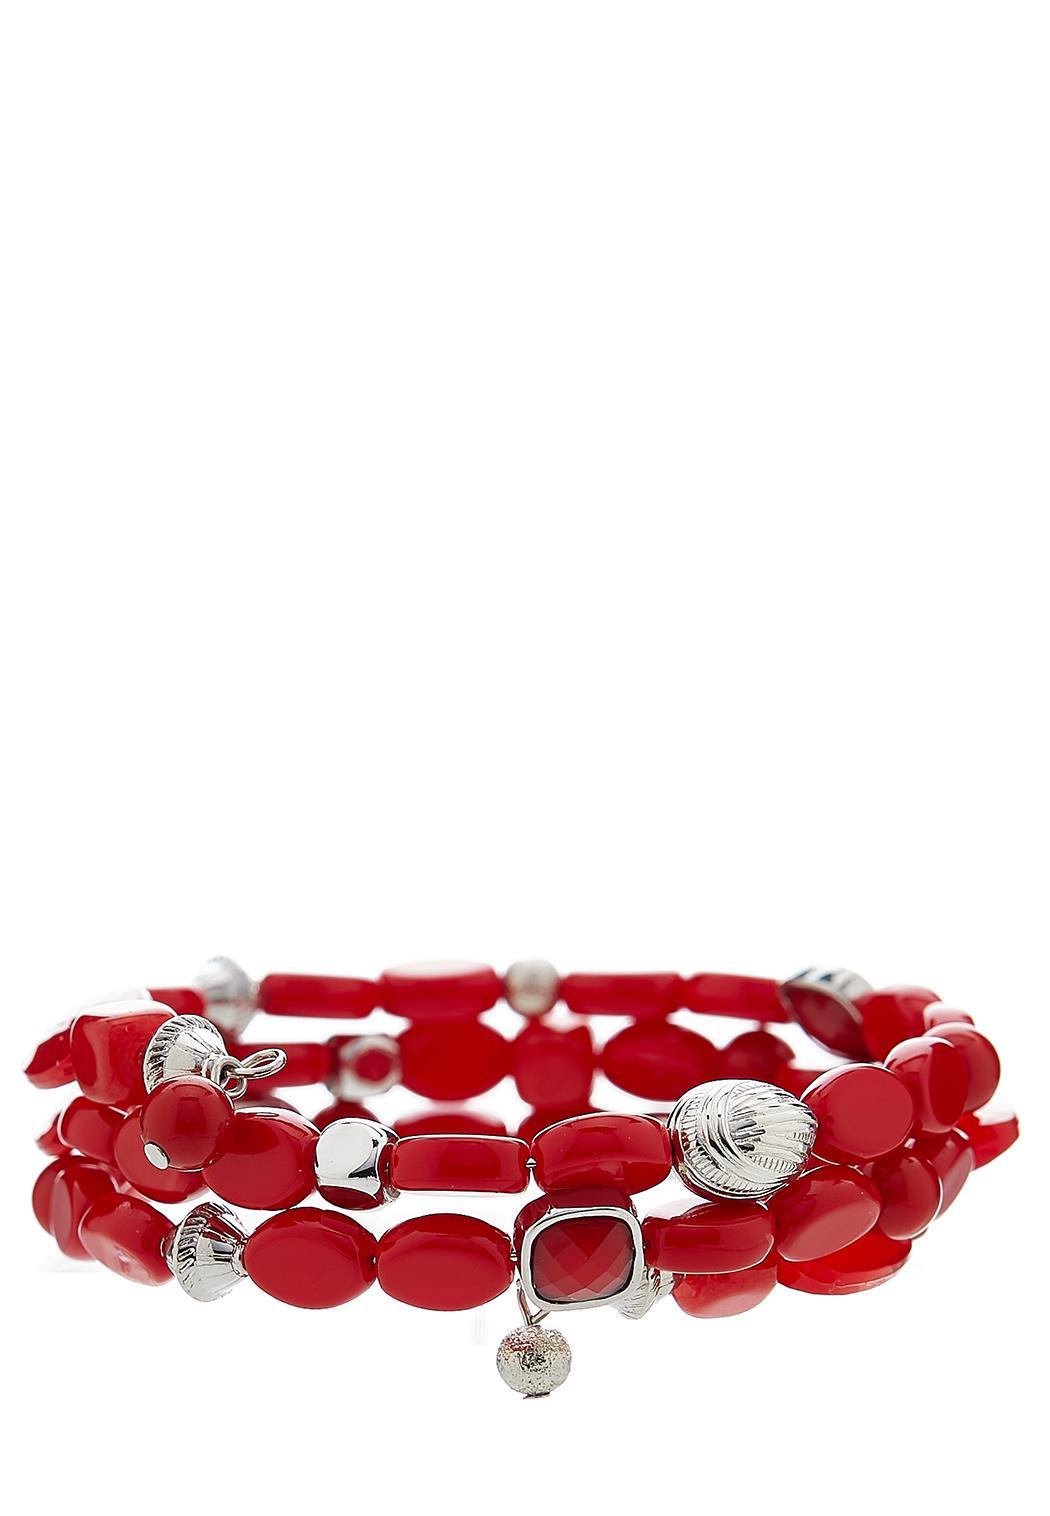 Chili Pepper Coil Bracelets